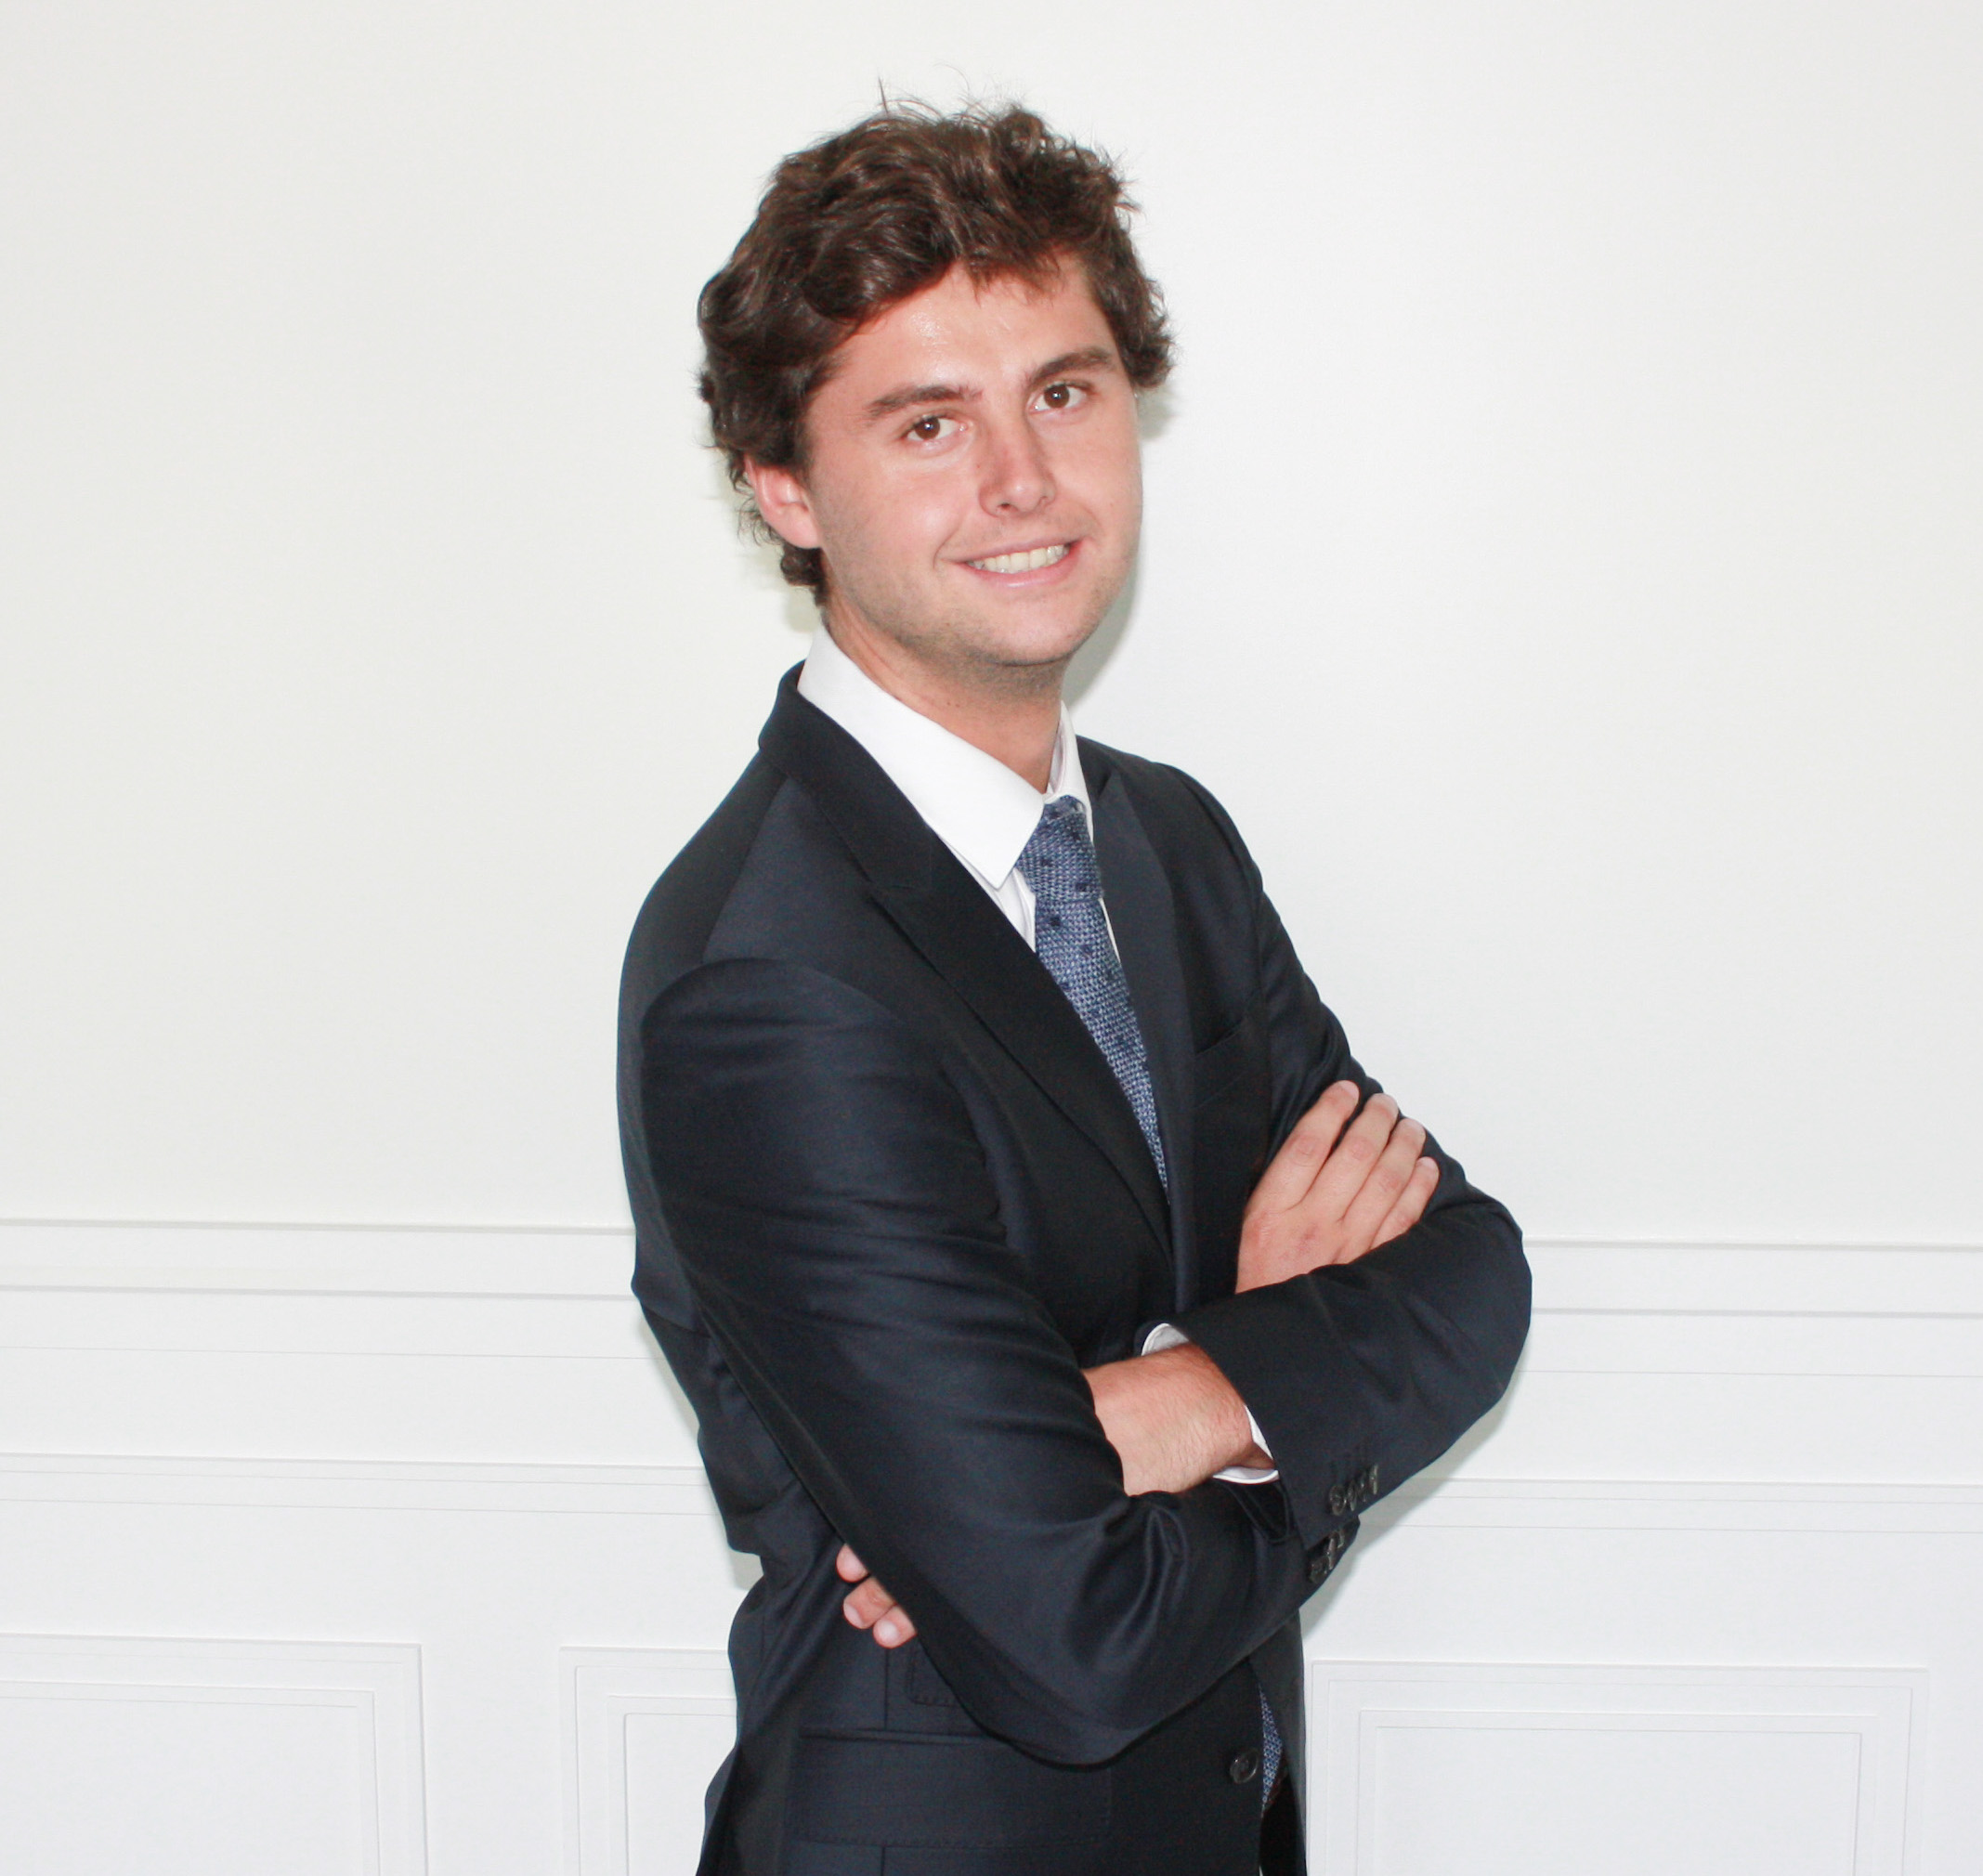 Pablo Salinas Idoate